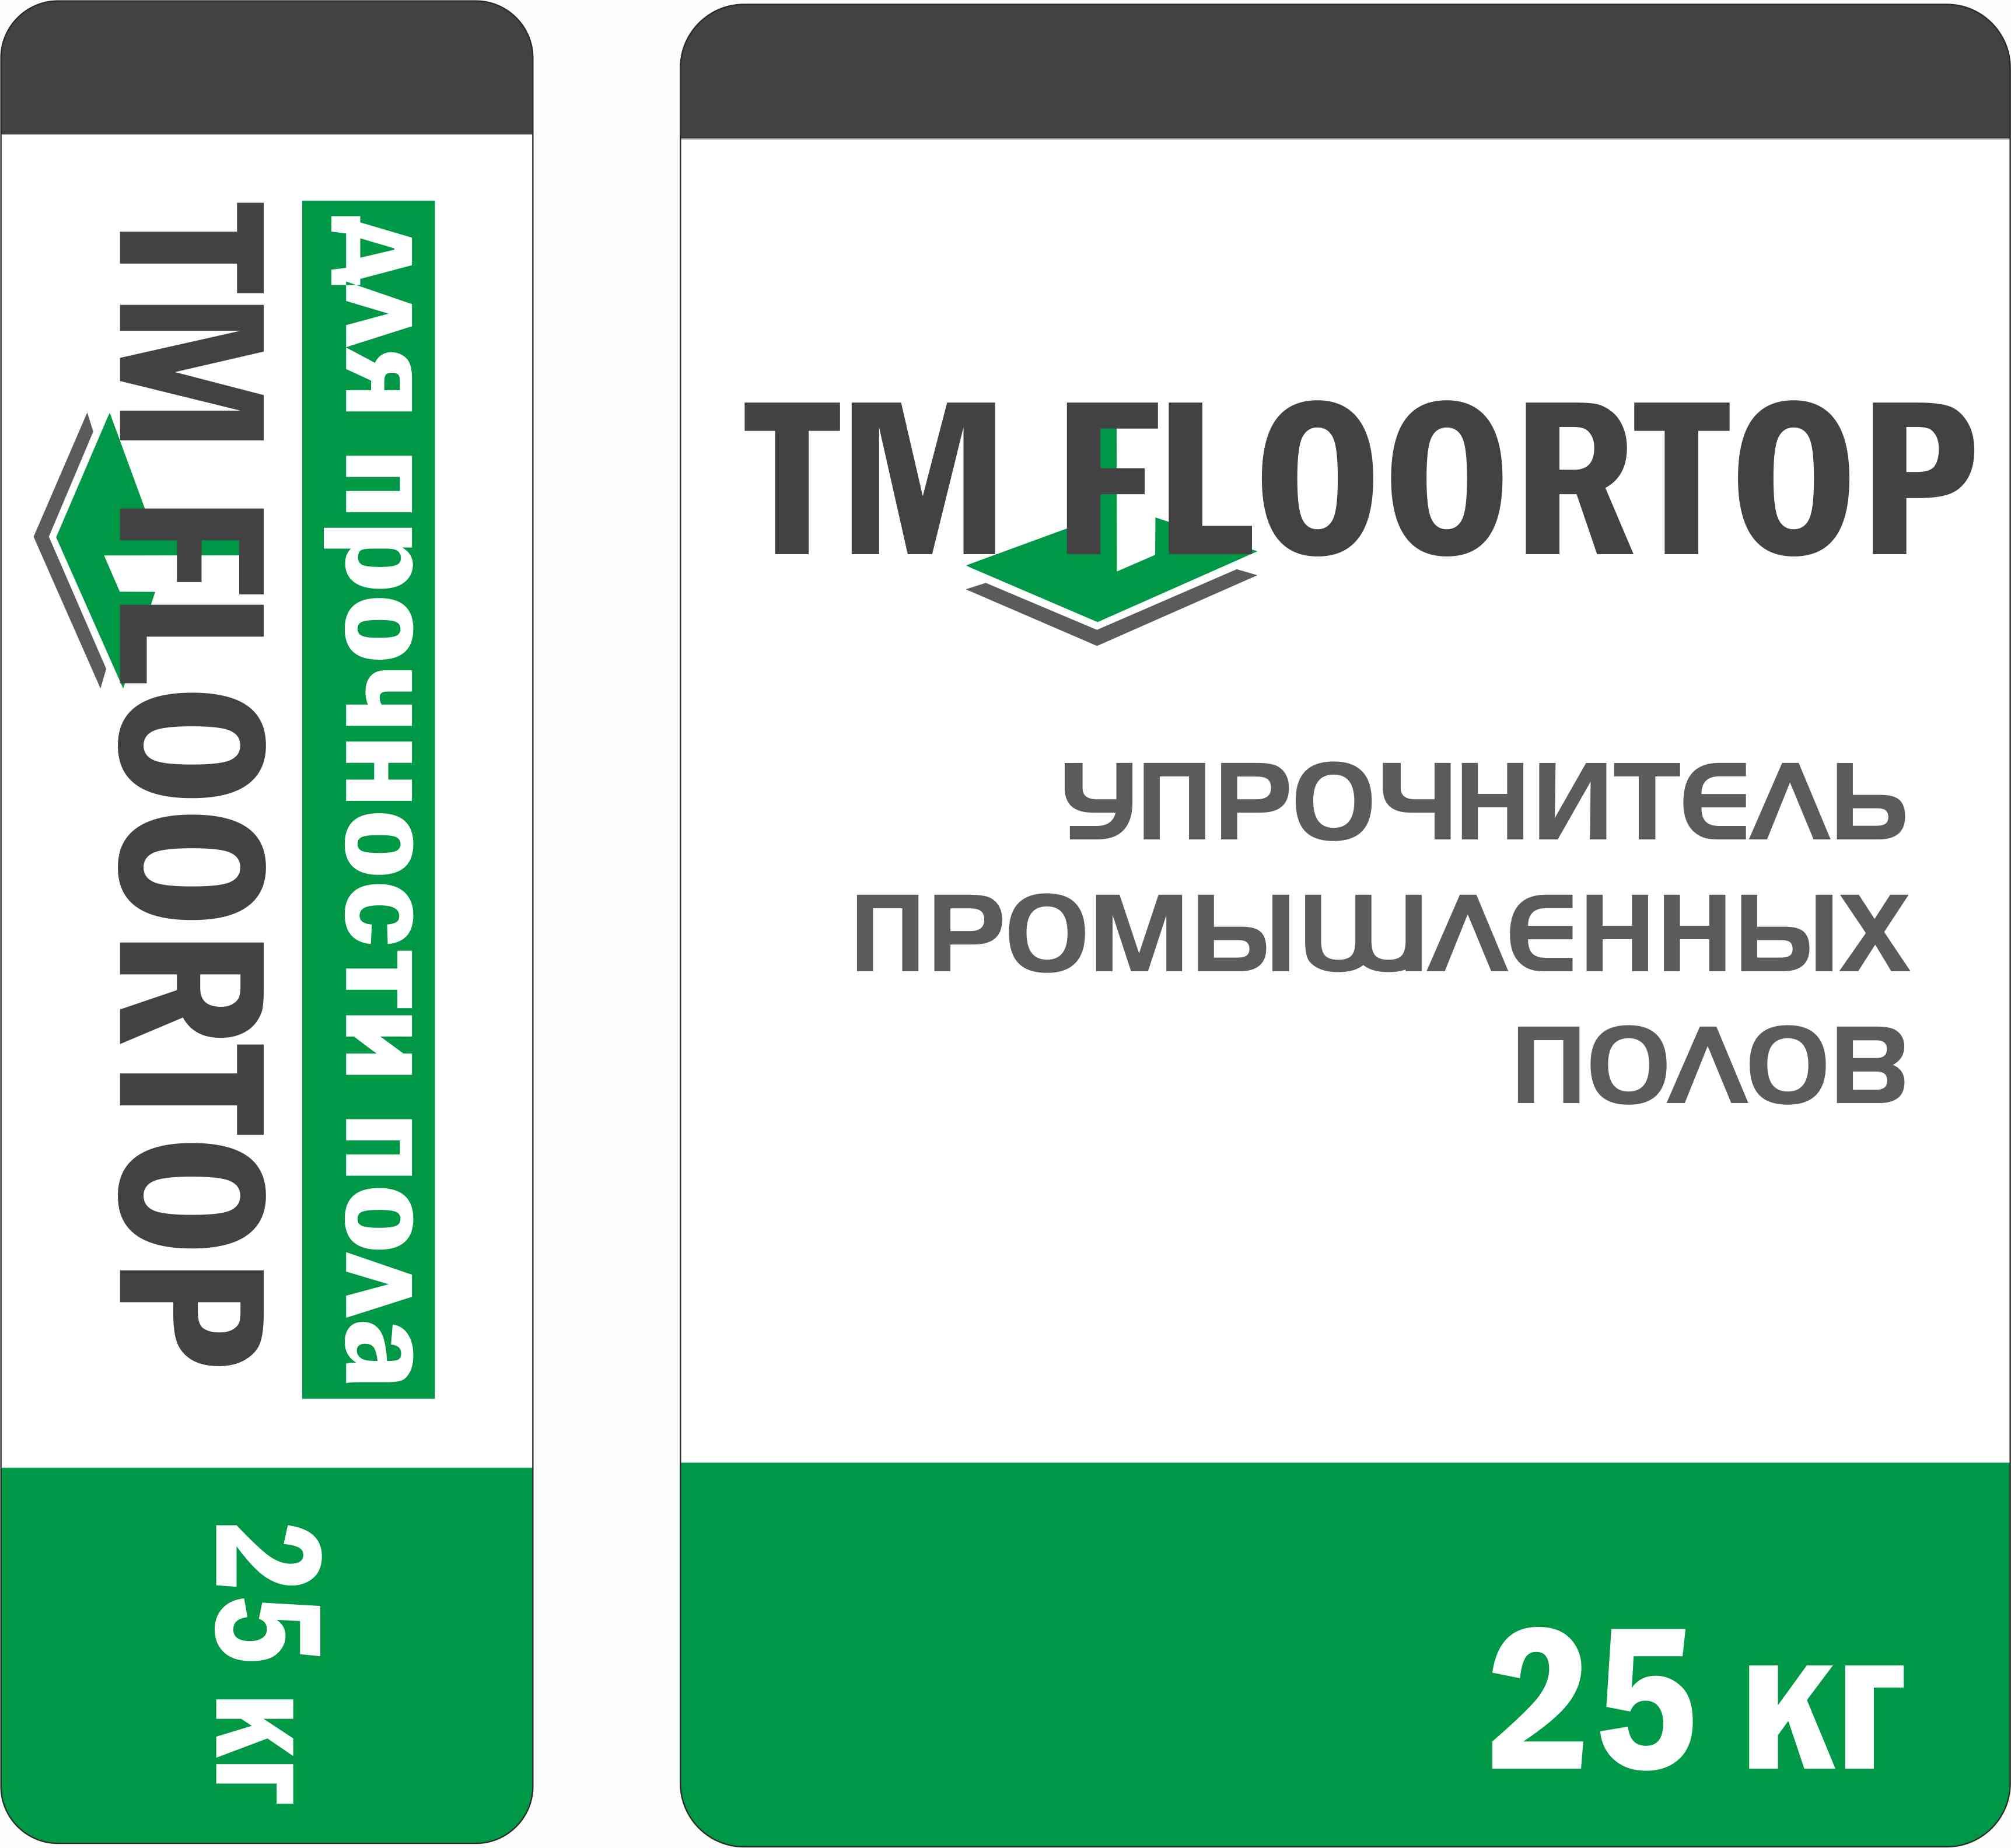 Разработка логотипа и дизайна на упаковку для сухой смеси фото f_3205d26c5fea73e0.jpg